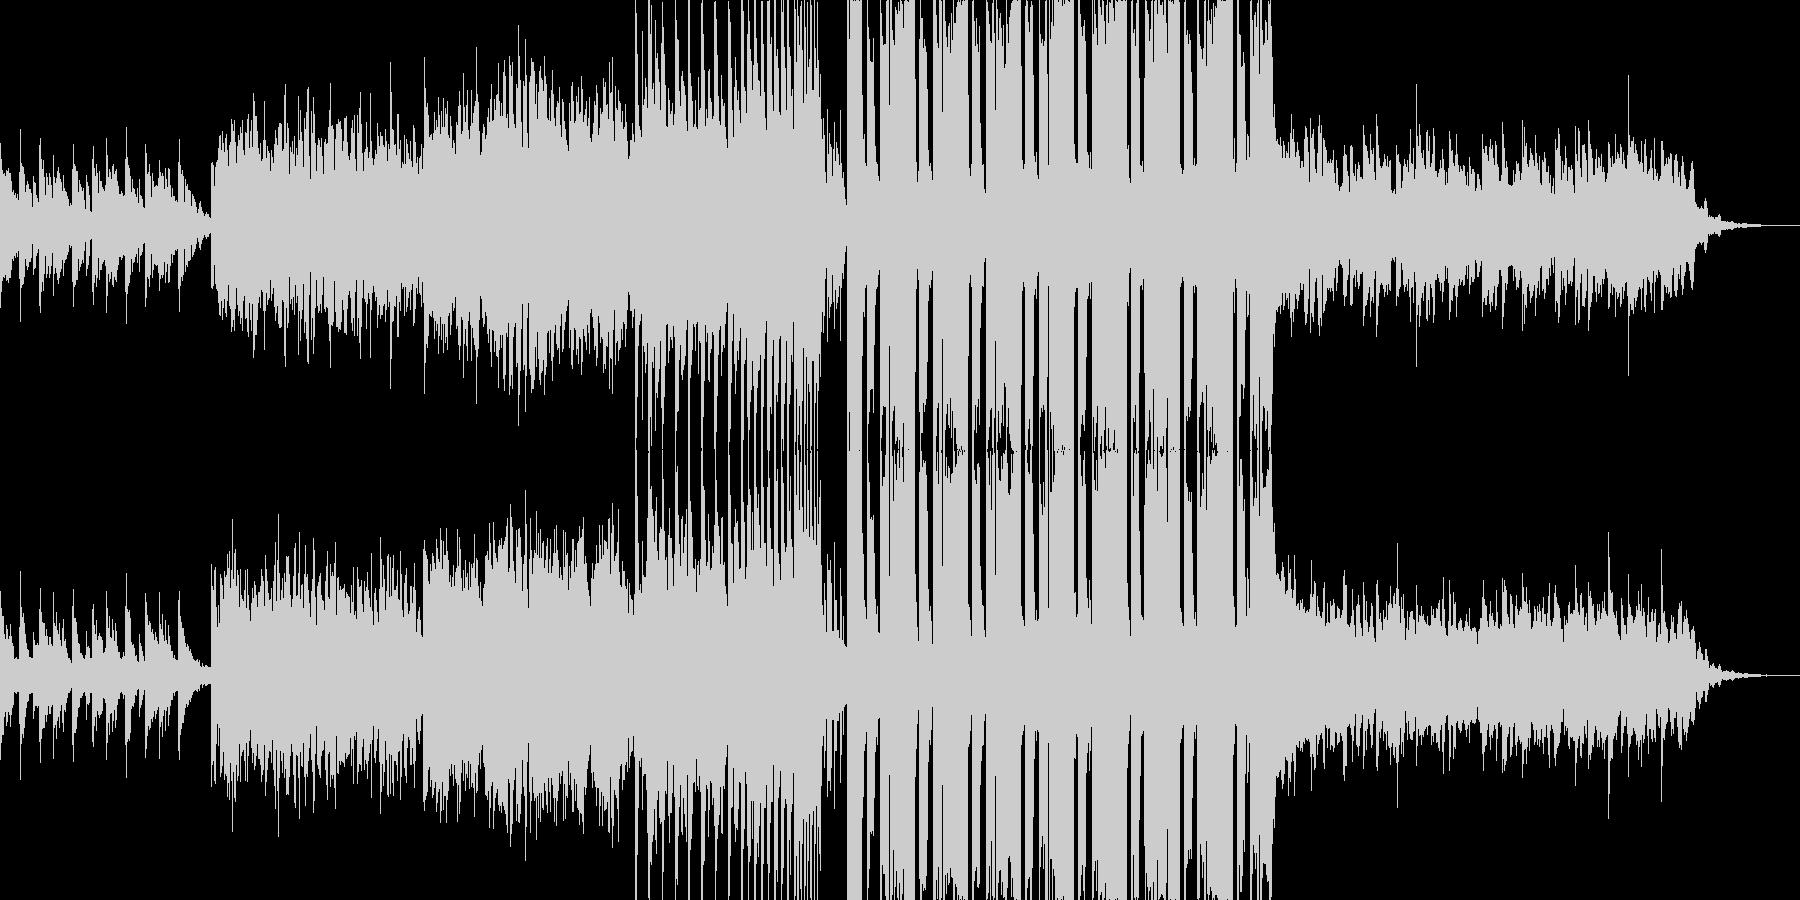 FuturePop、洋楽、ポップス、夏bの未再生の波形